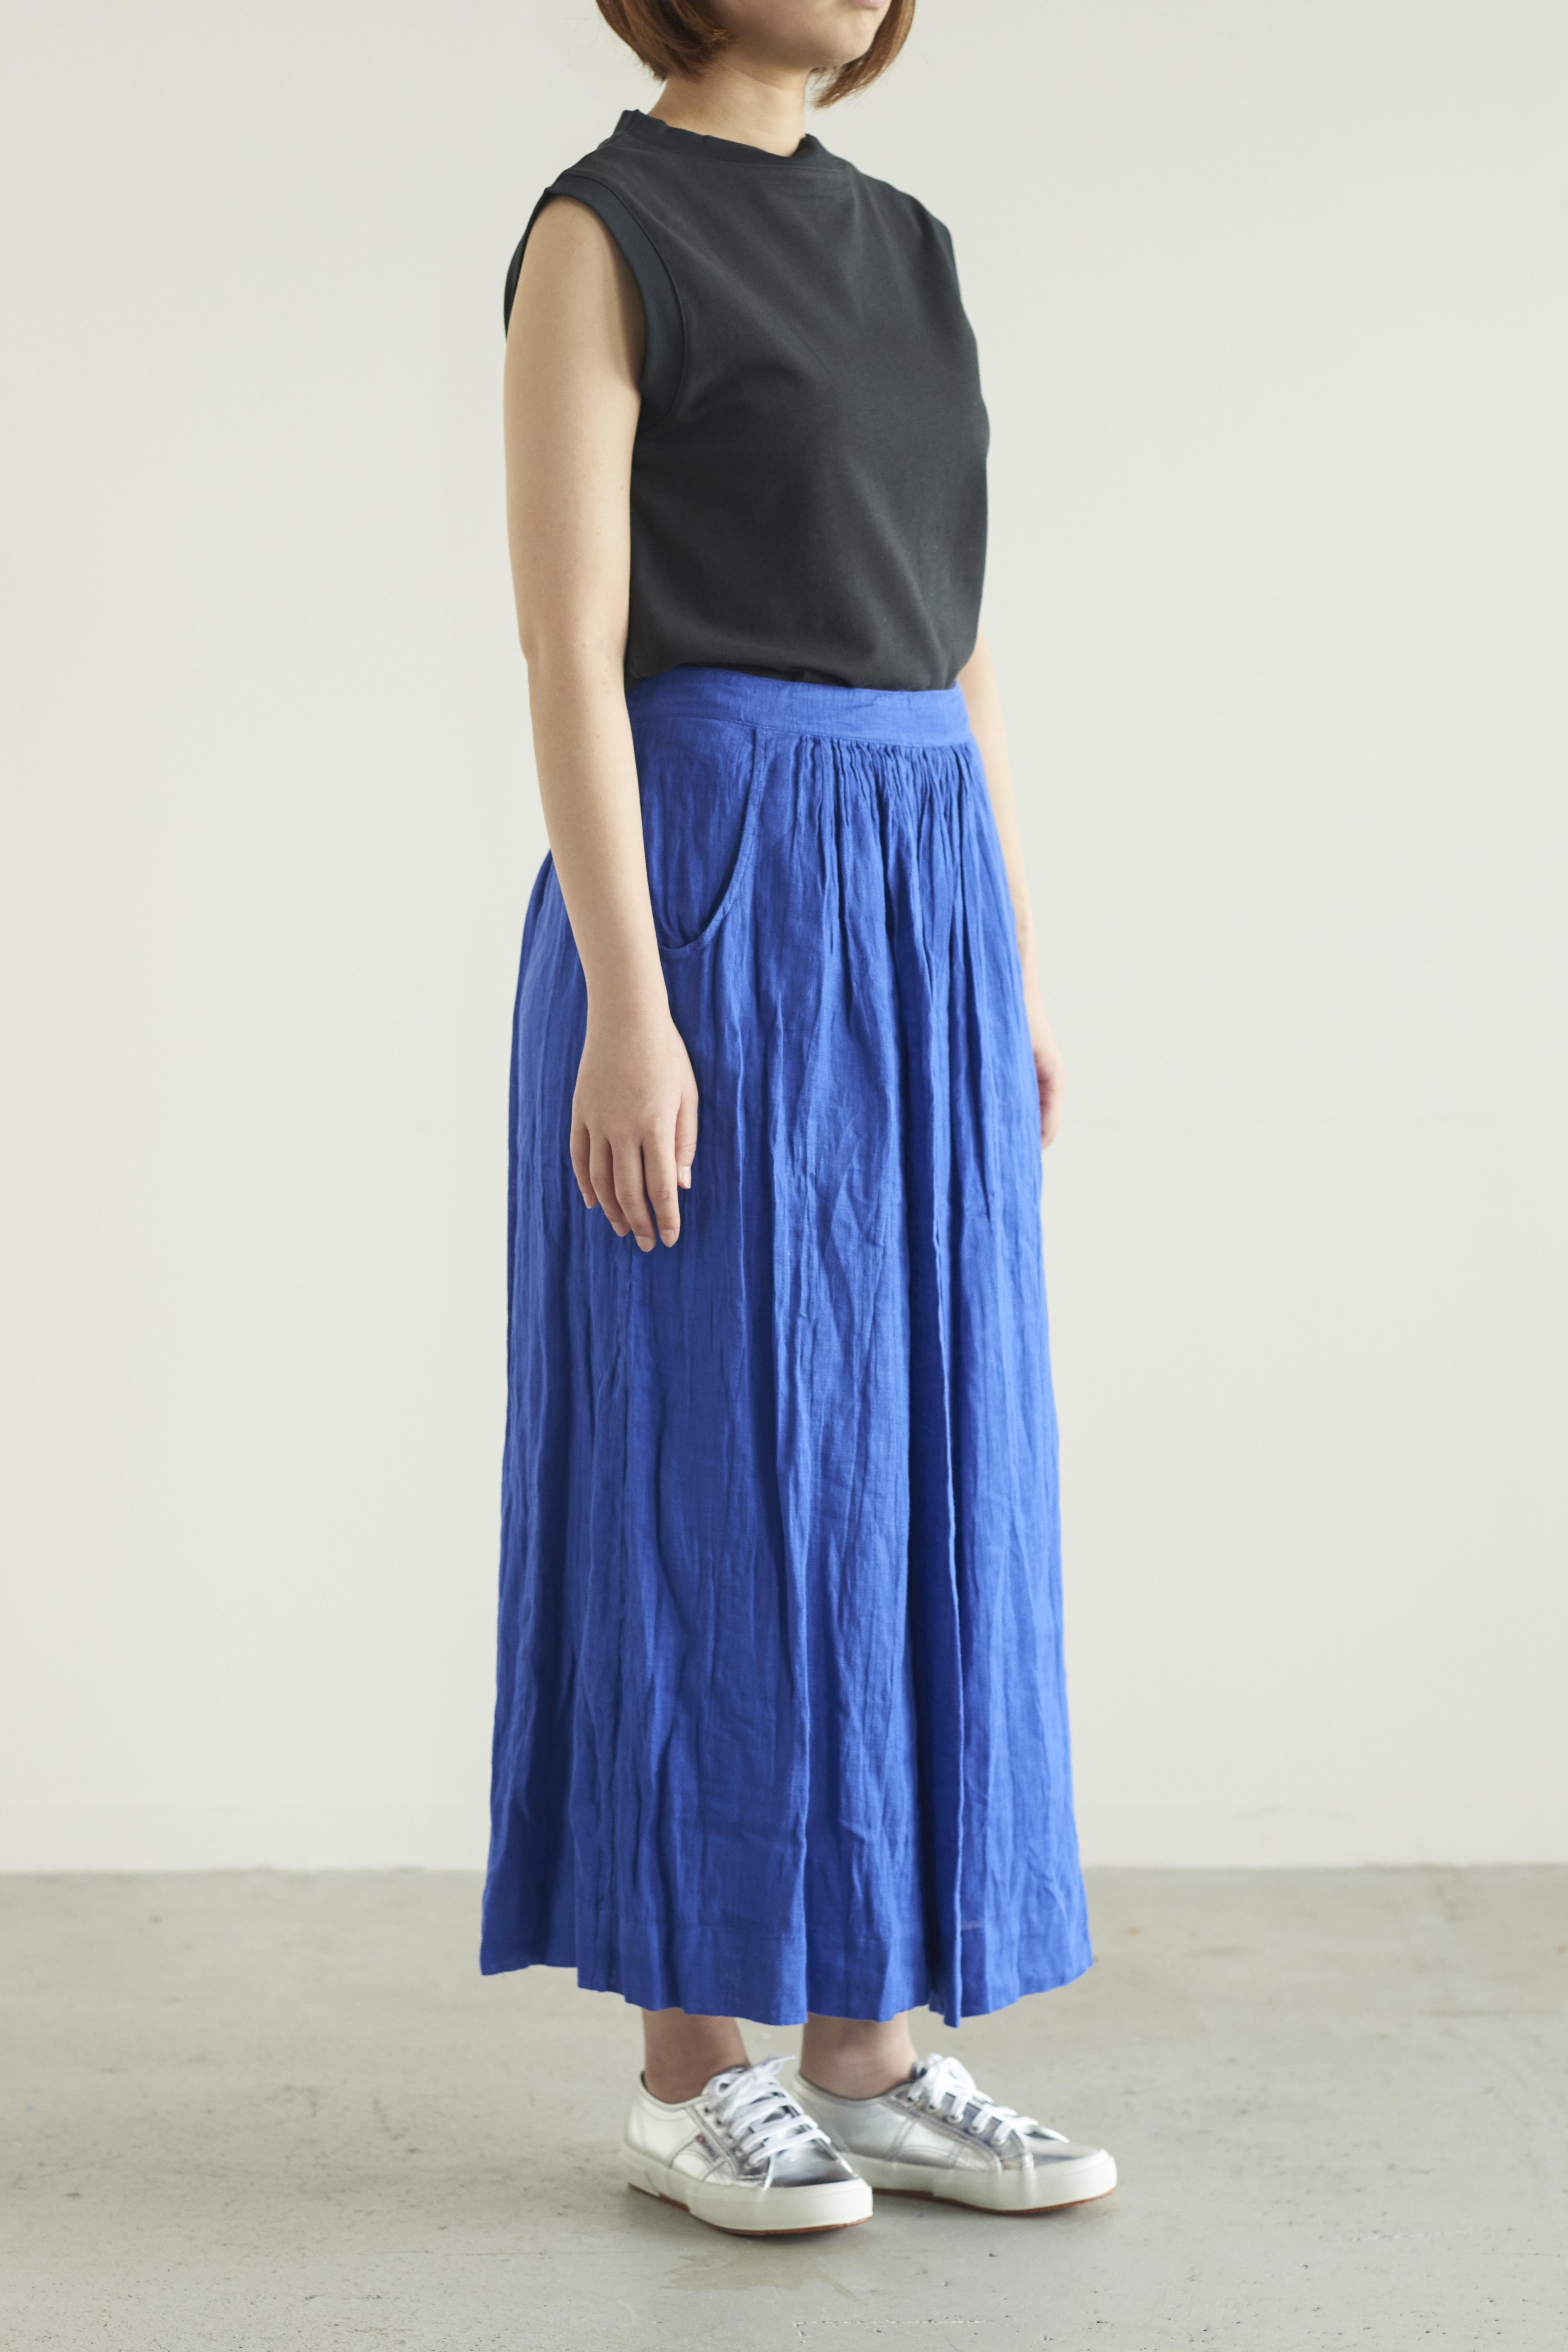 ZYGA skirt